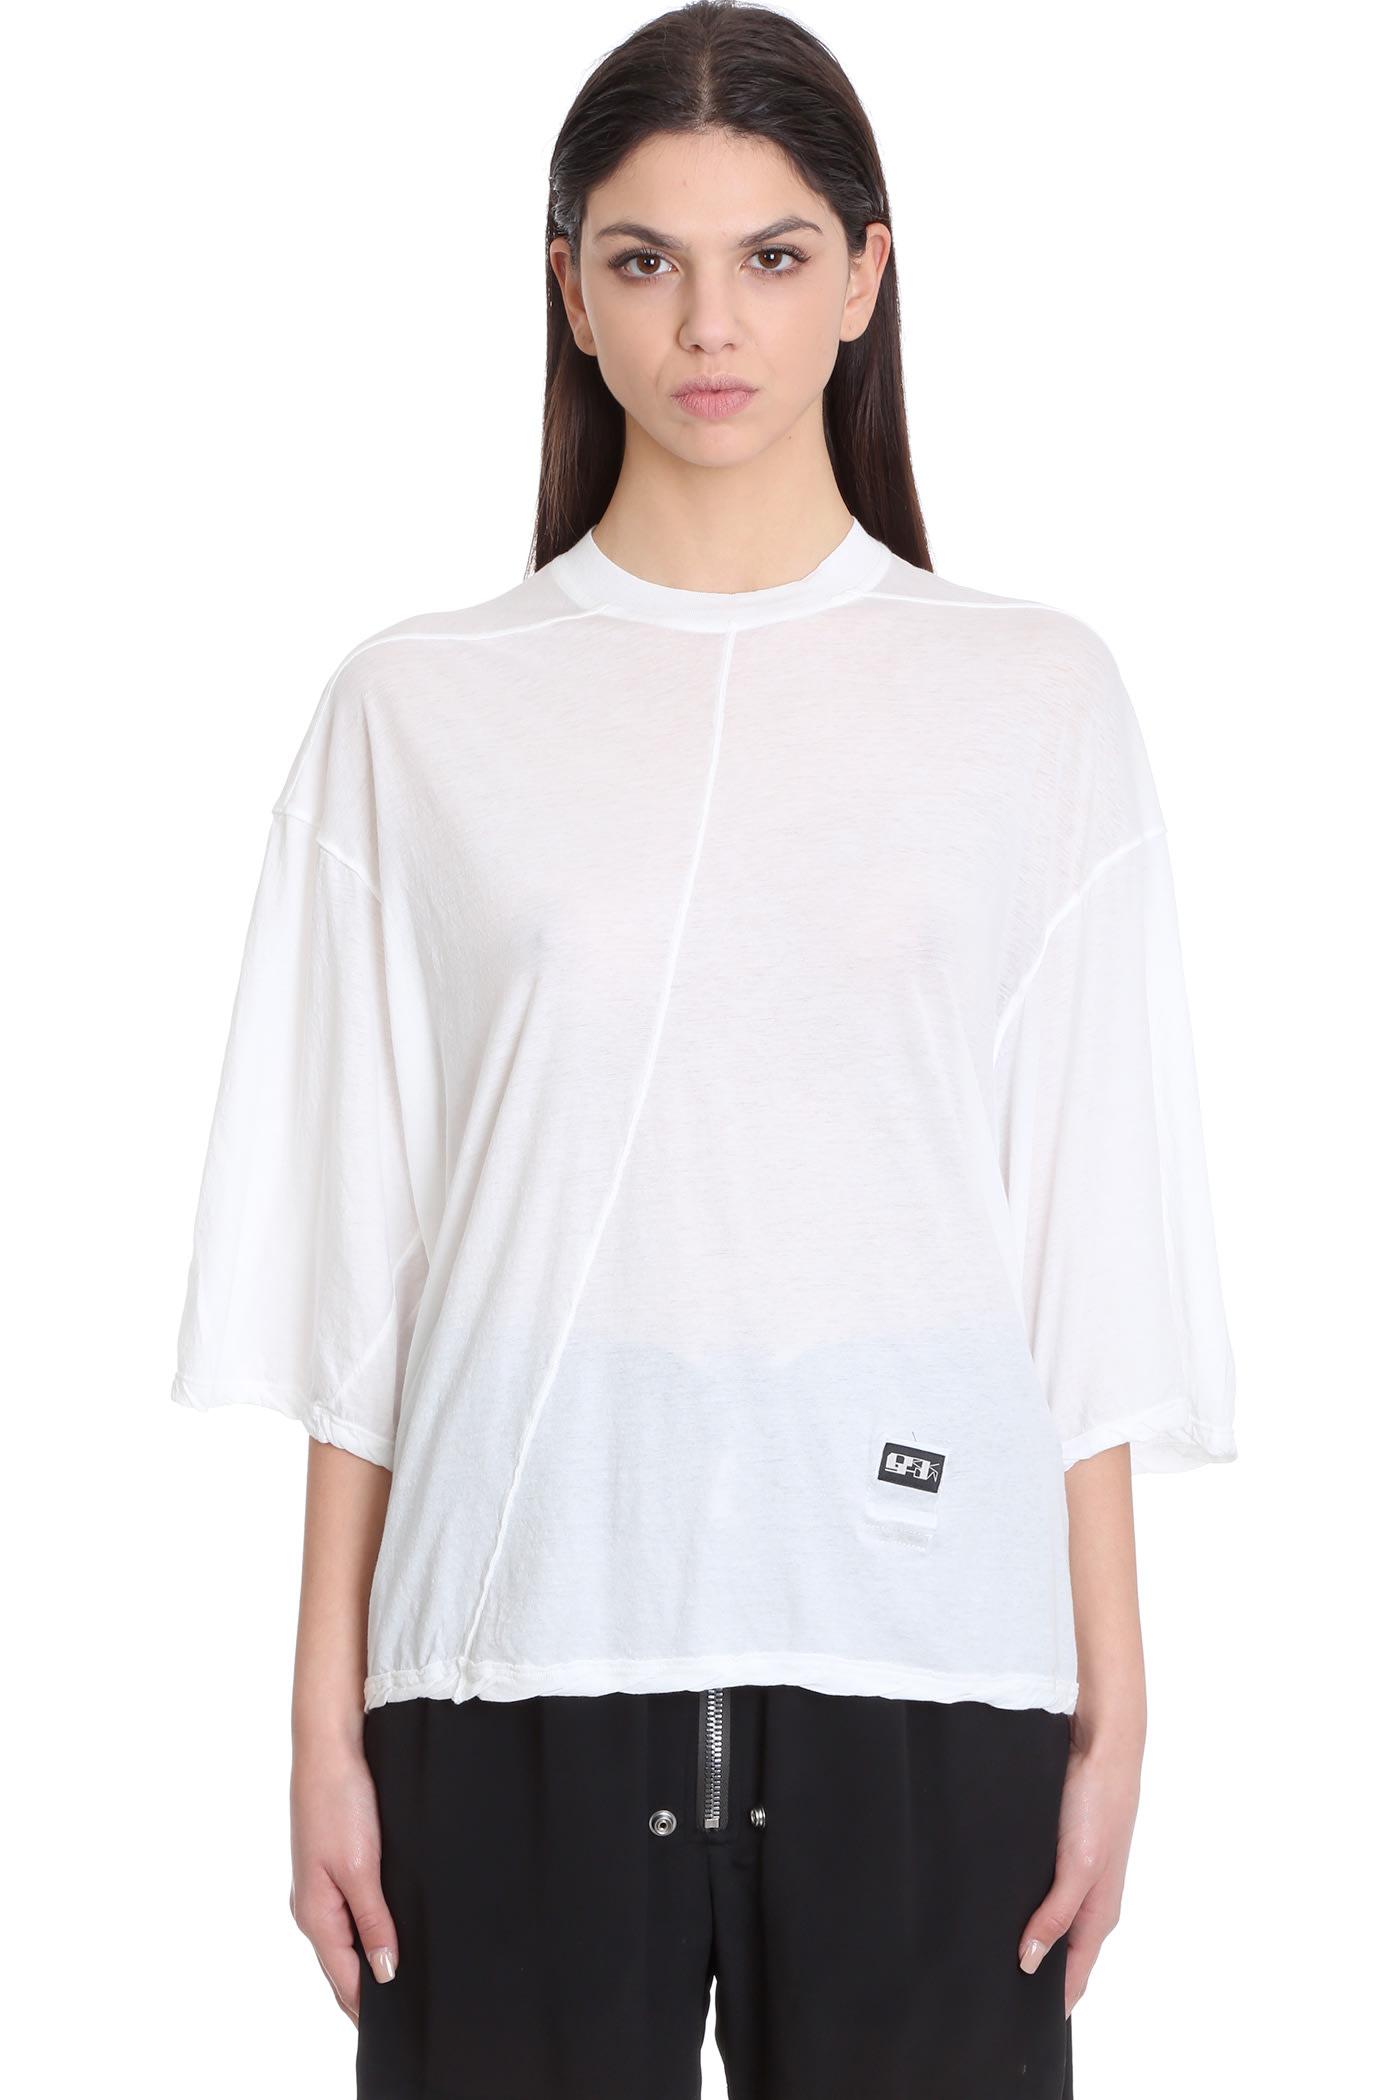 Jumbo Top Topwear In White Cotton